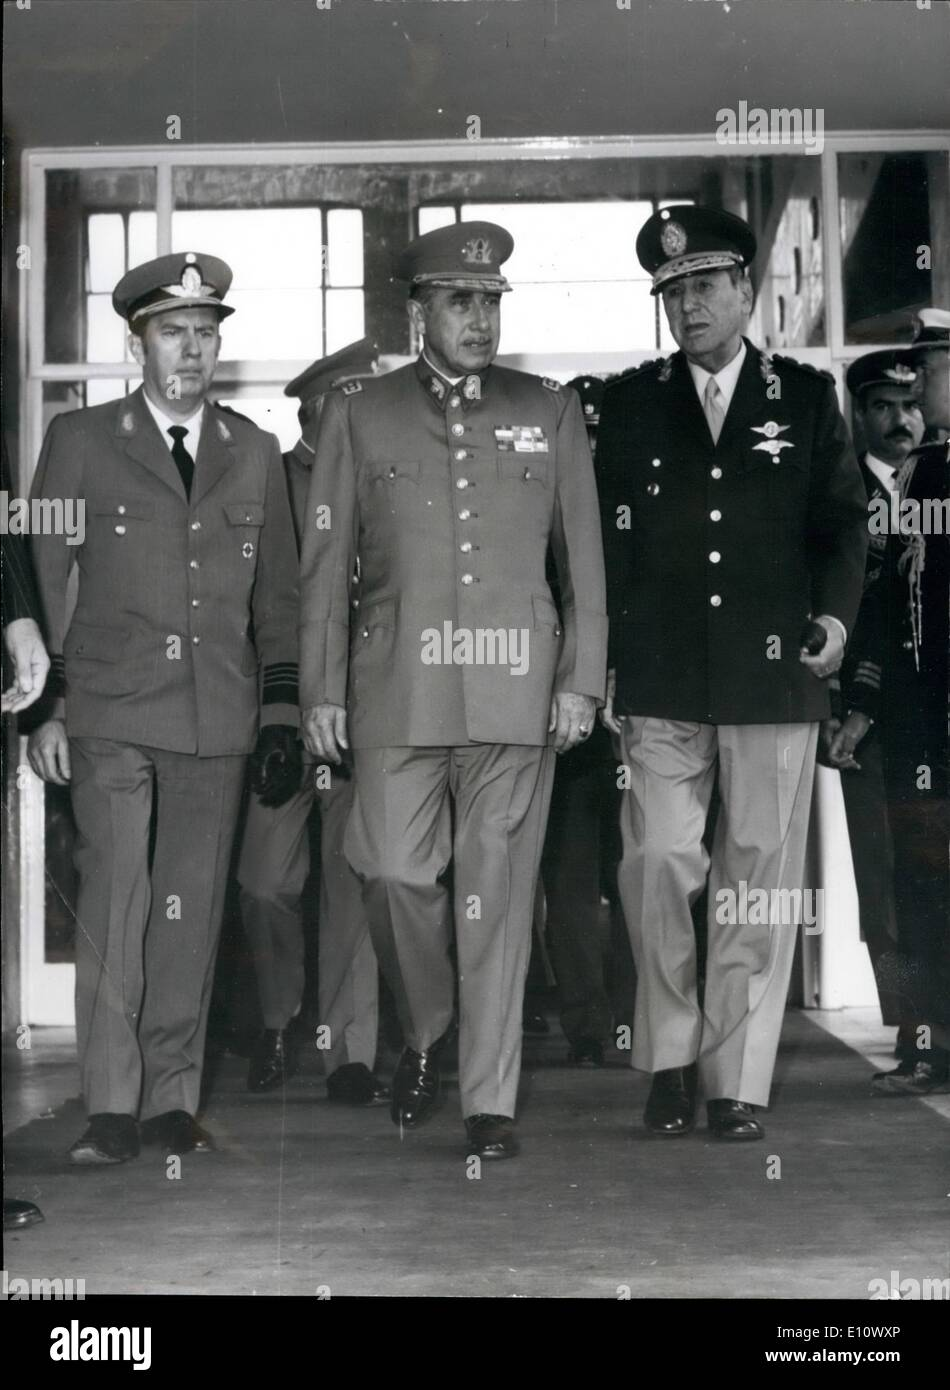 General Pinochet Fotos E Imagenes De Stock Alamy